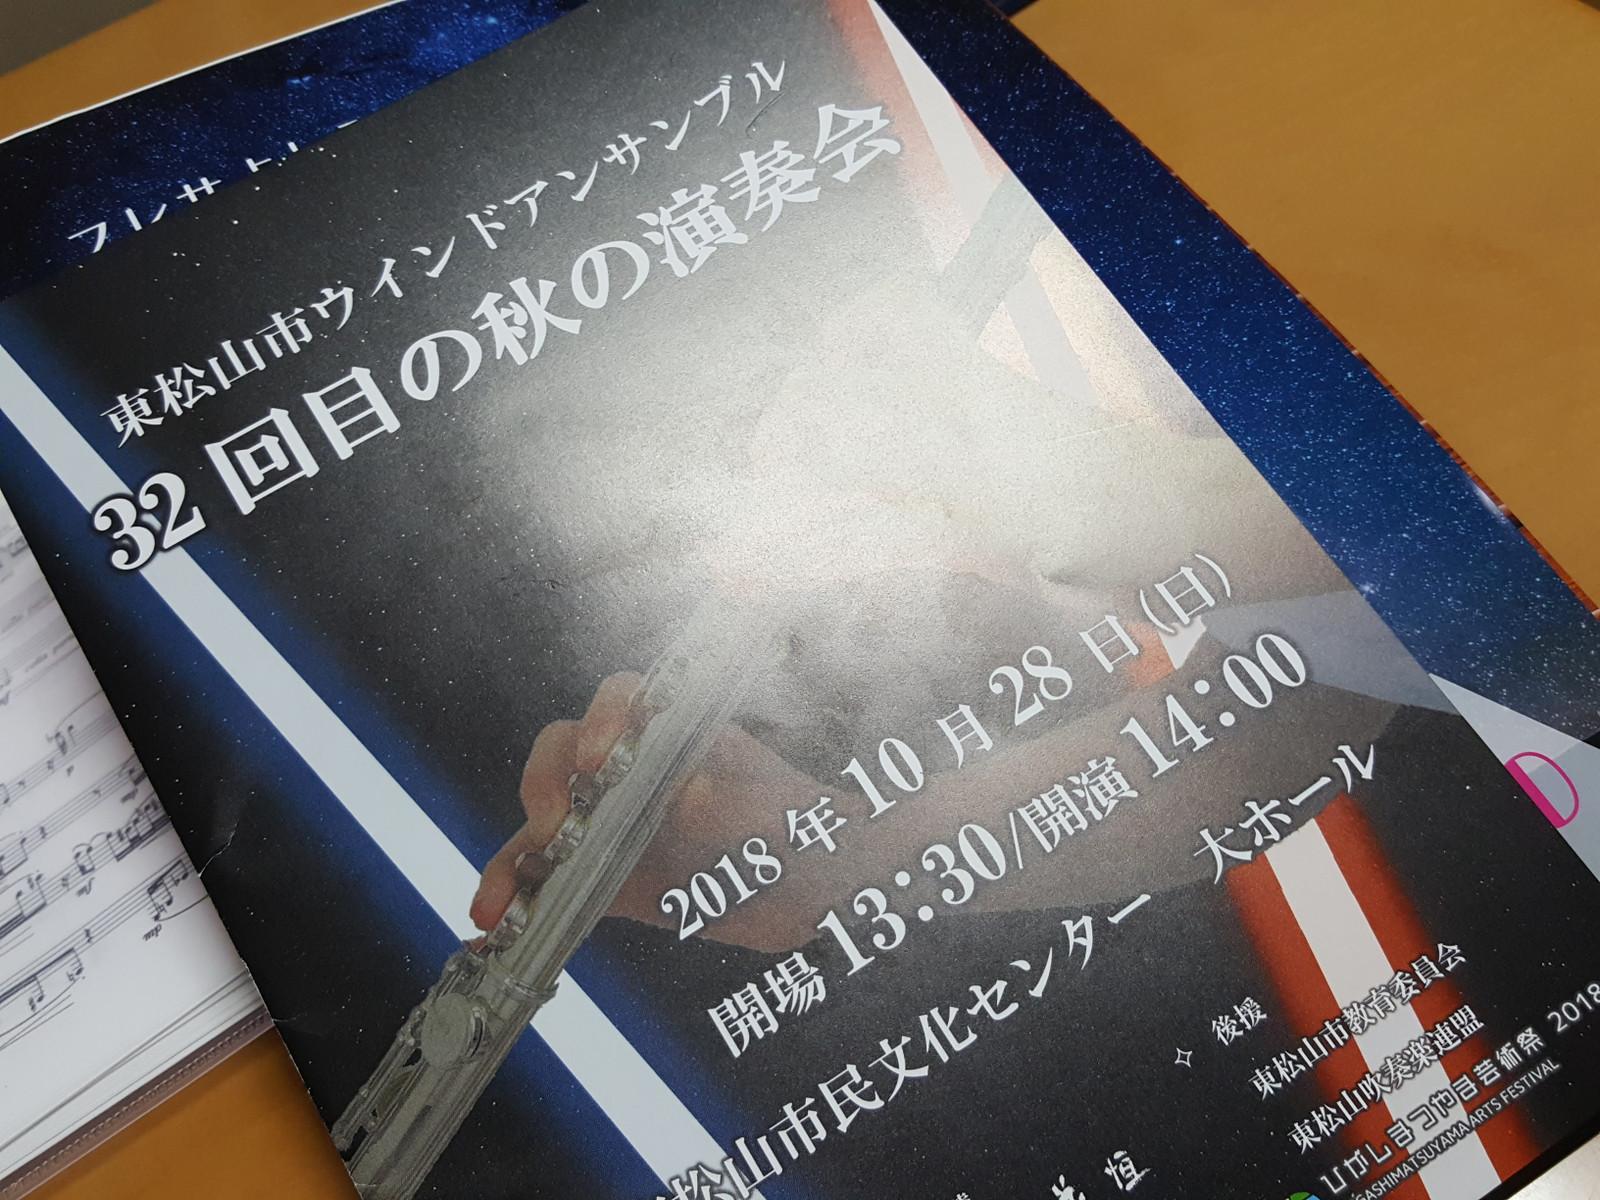 20181028_202519